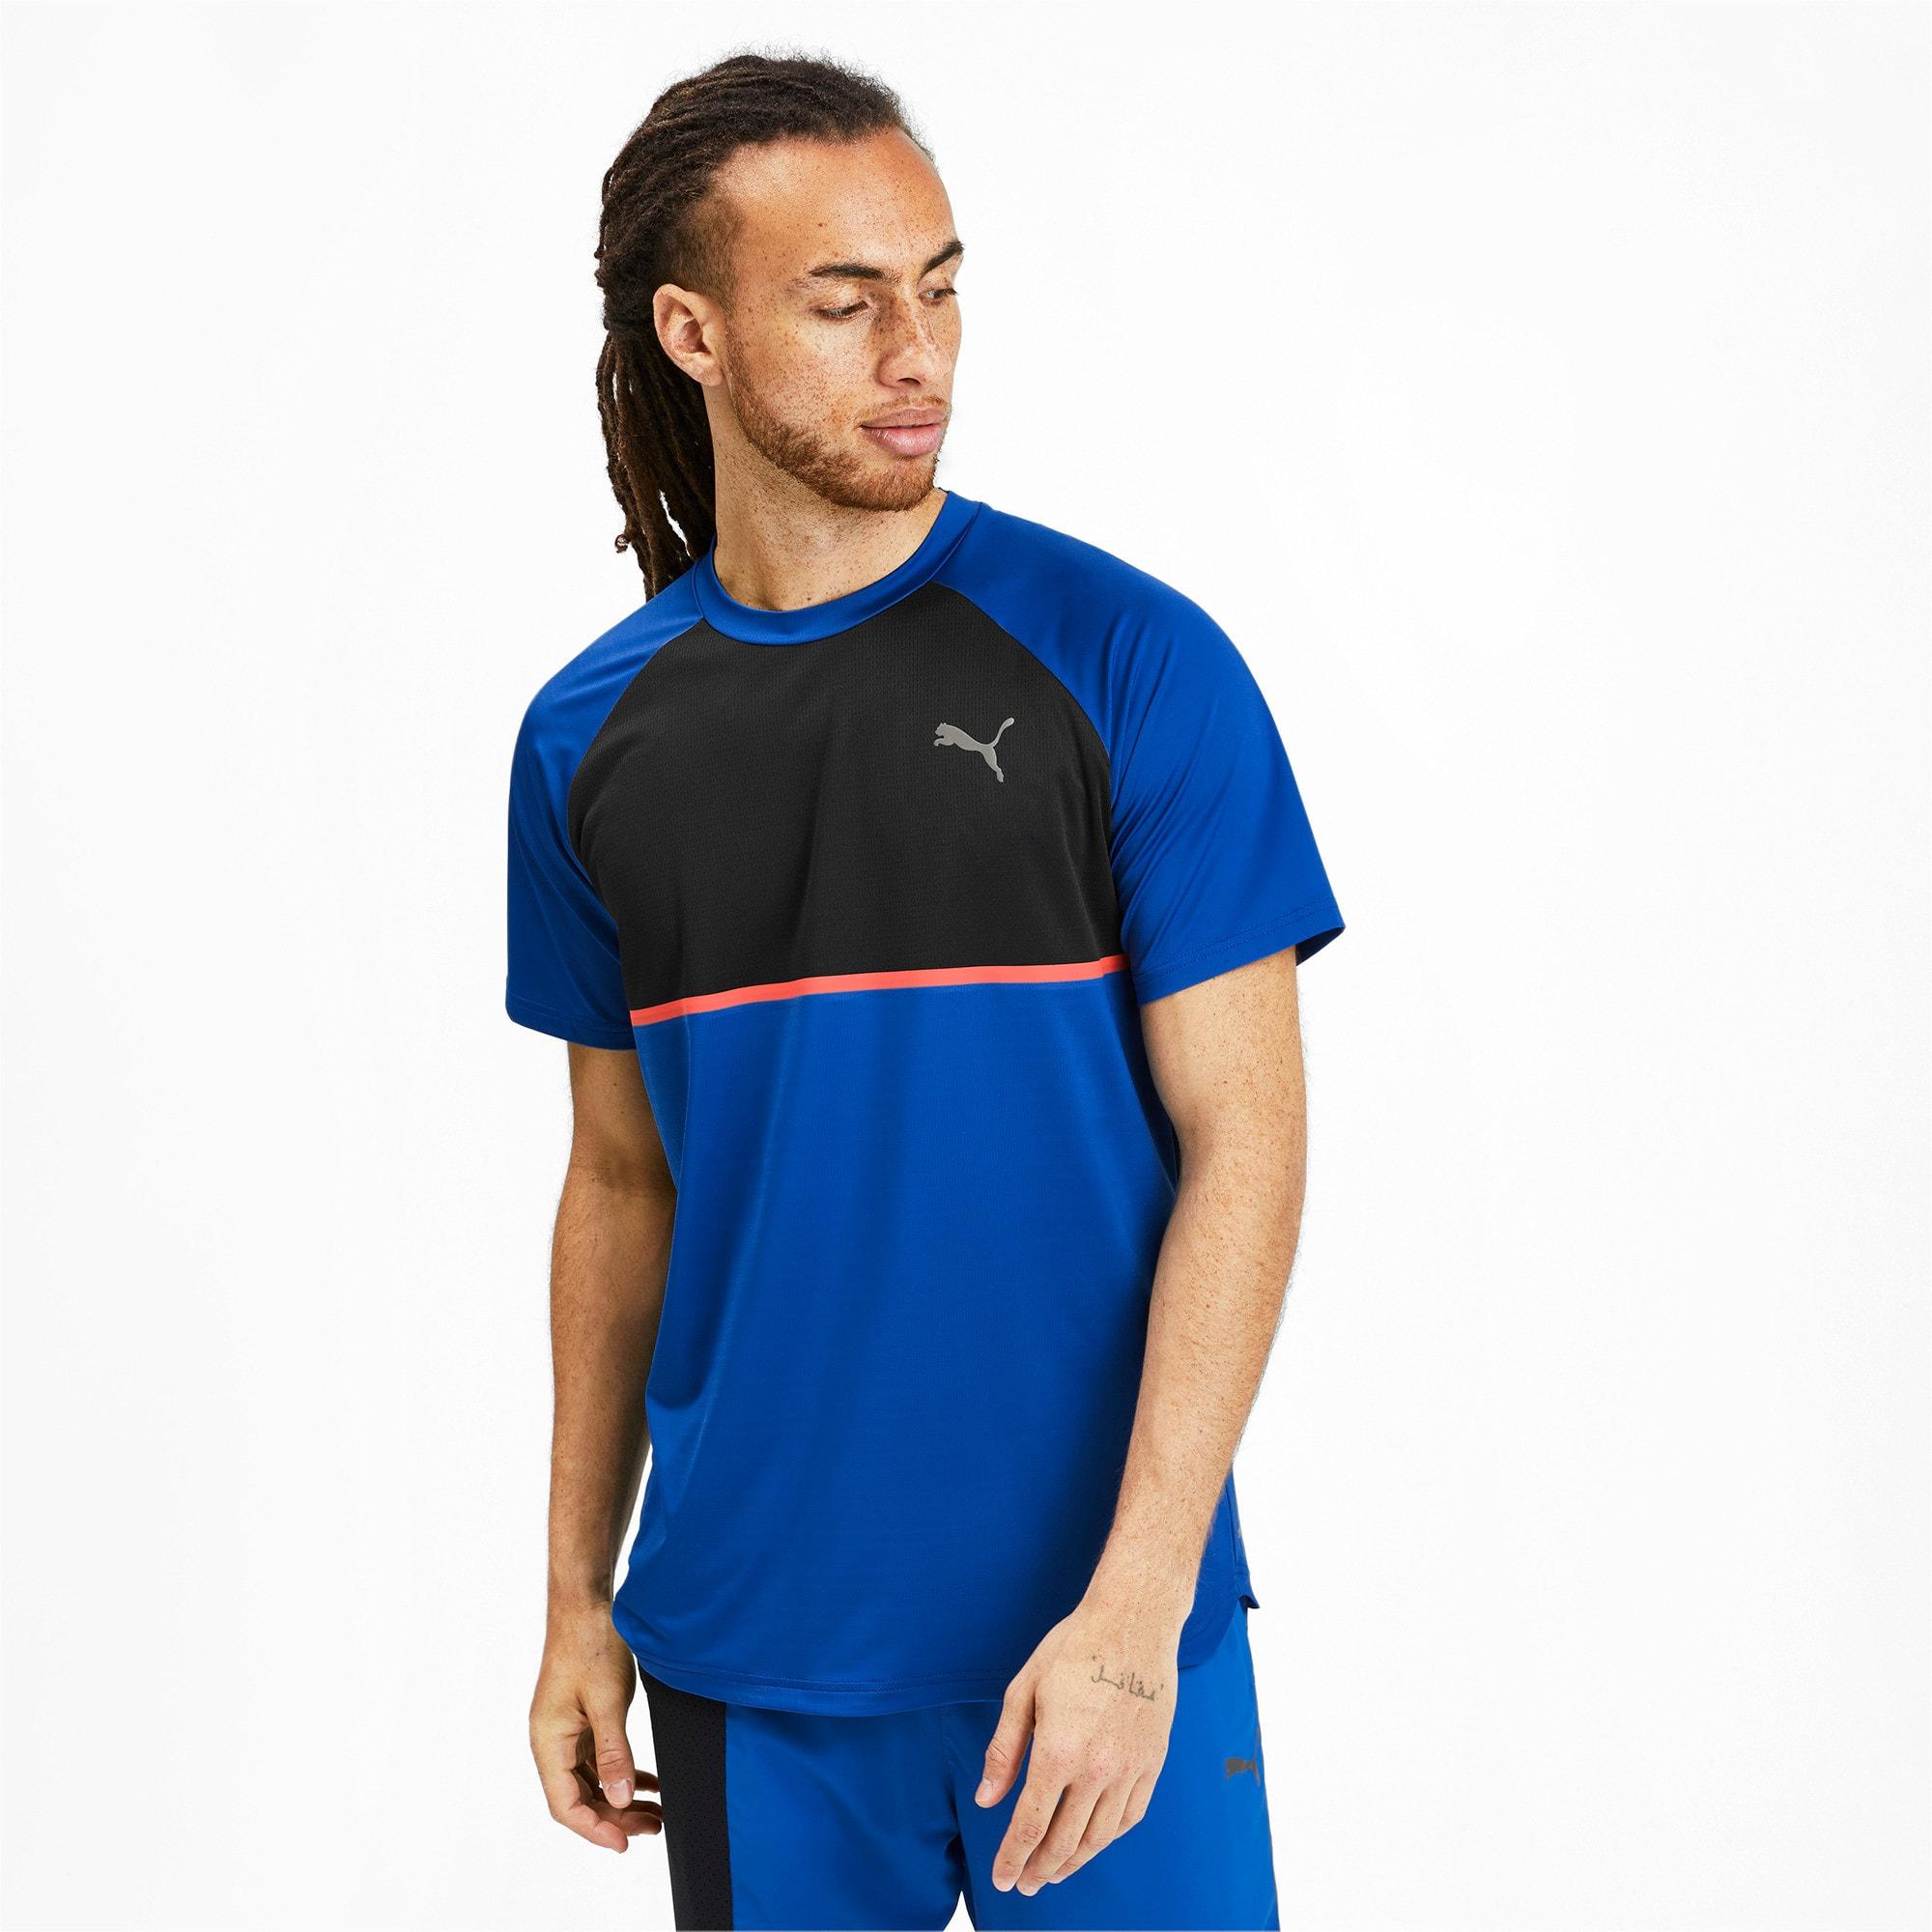 Thumbnail 1 of Power BND T-shirt voor heren, Galaxy Blue-Puma Black, medium